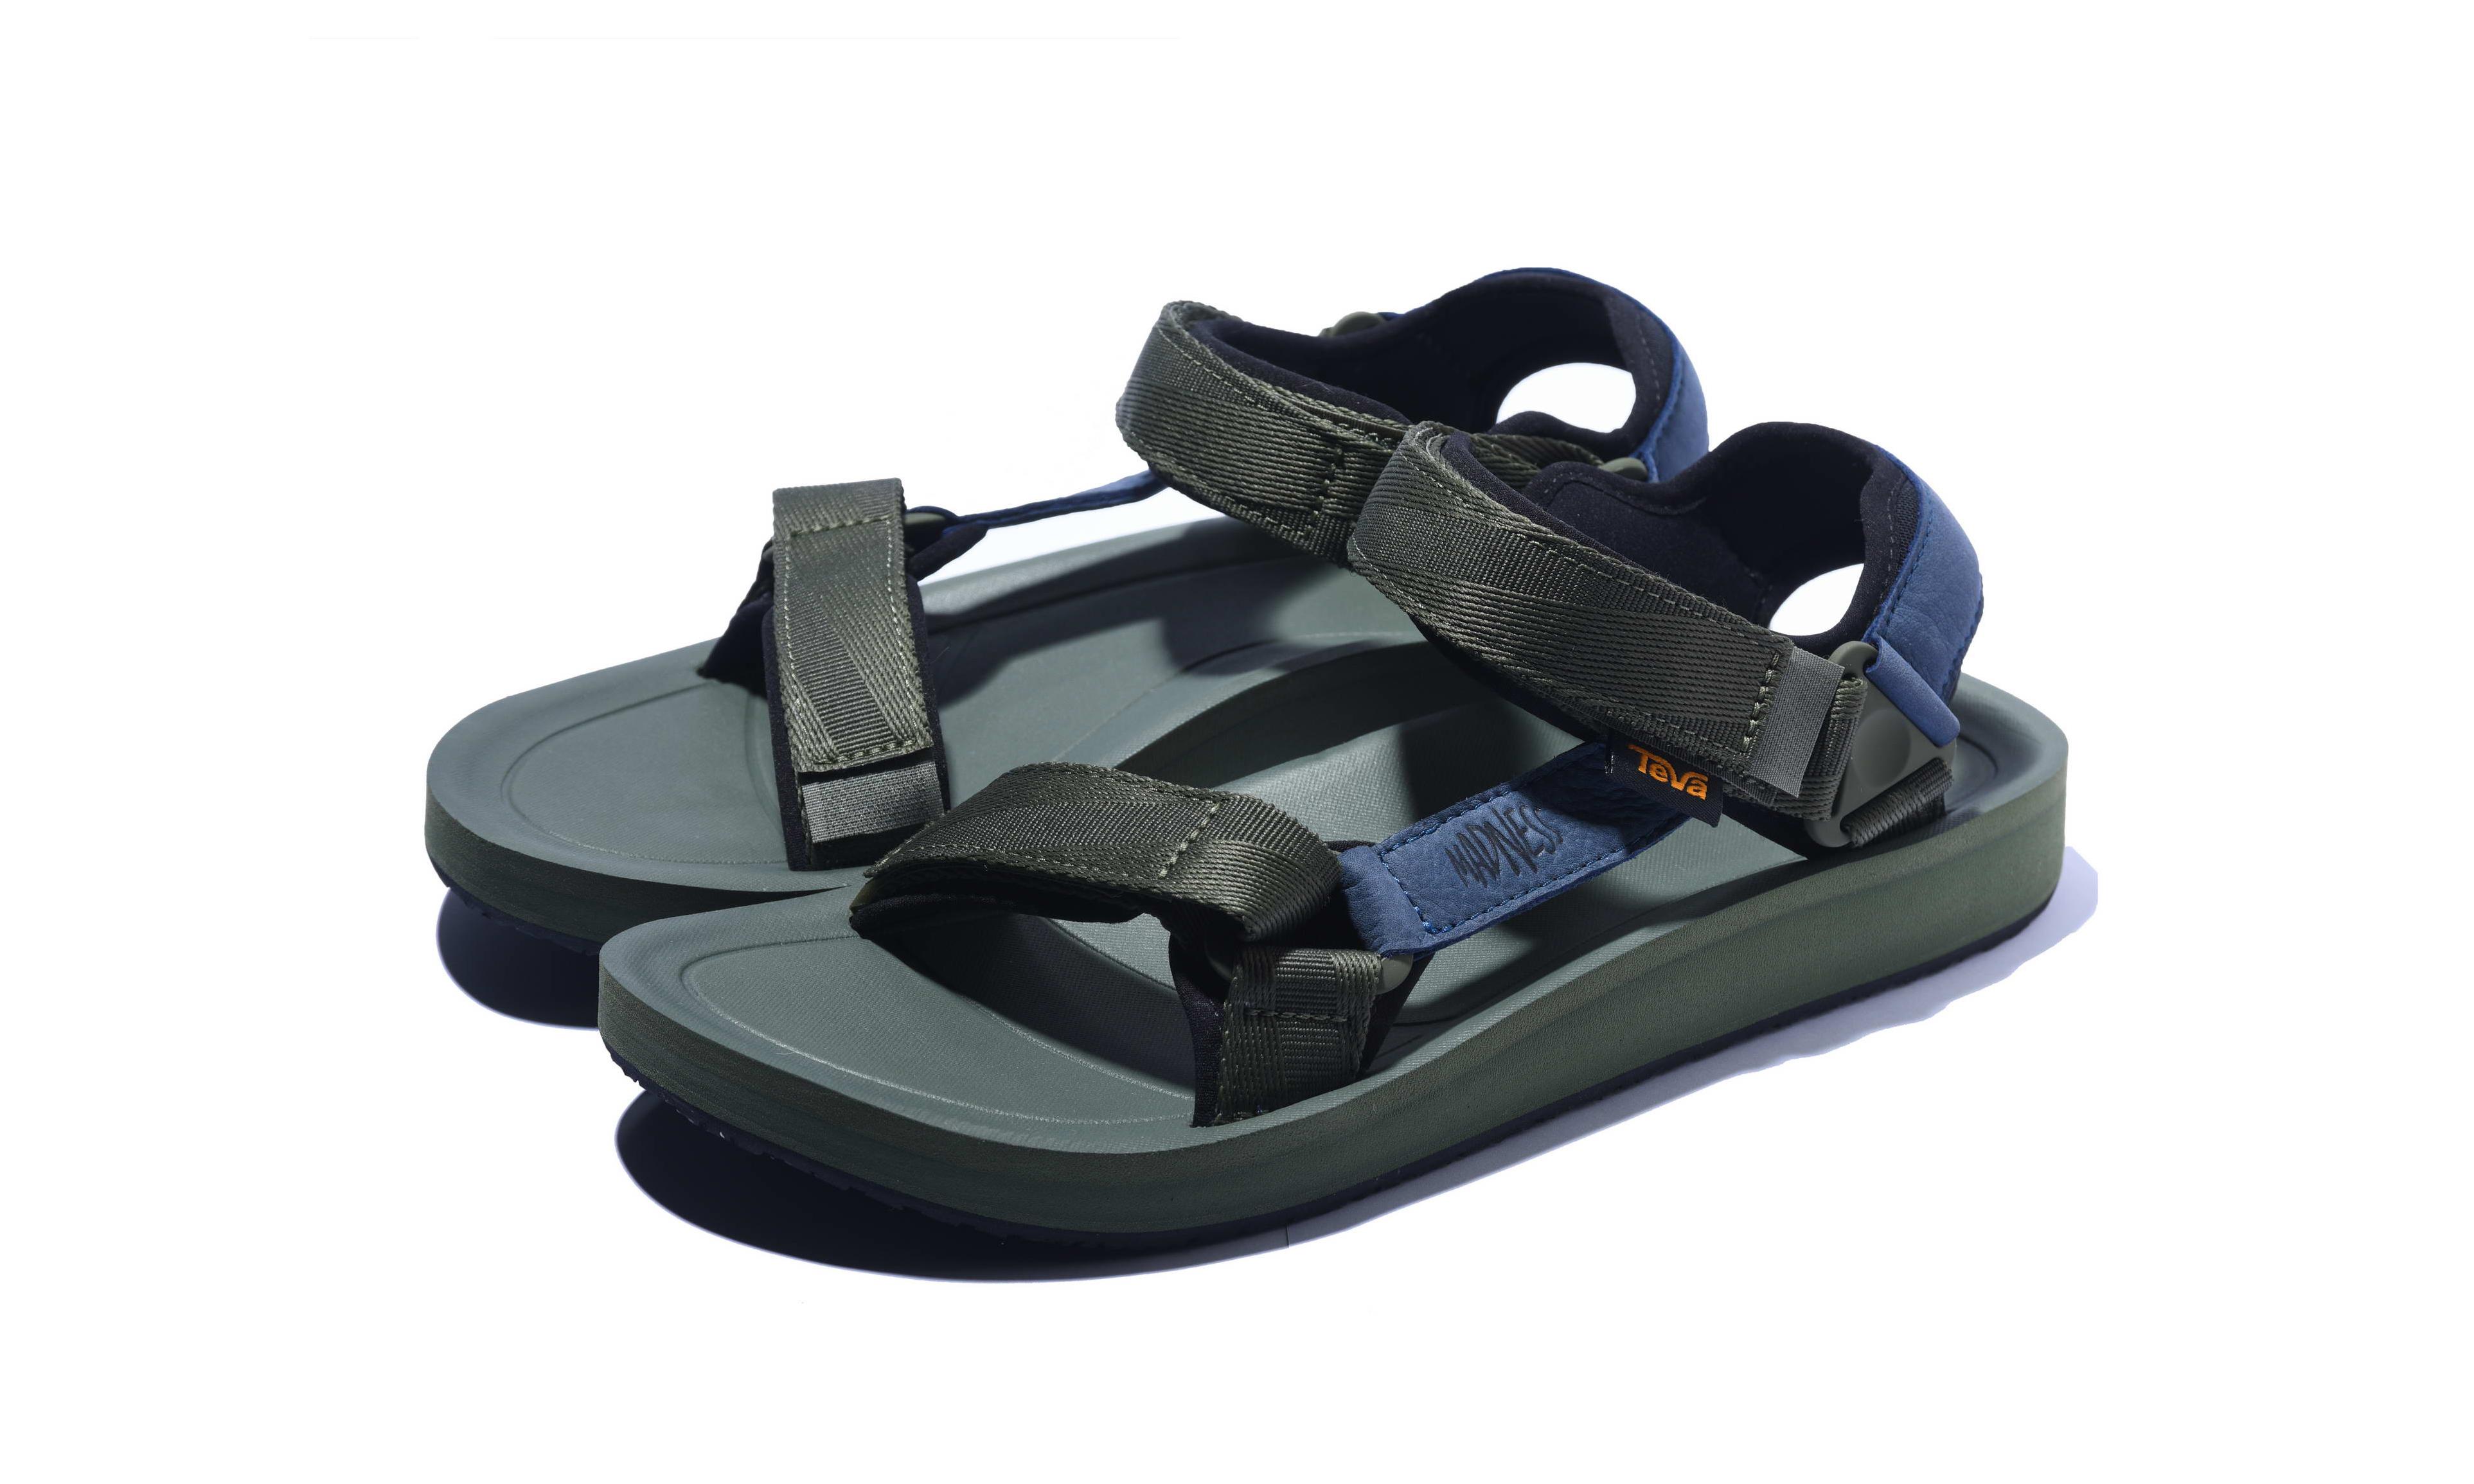 Teva x MADNESS 摩登户外凉鞋发售详情公布